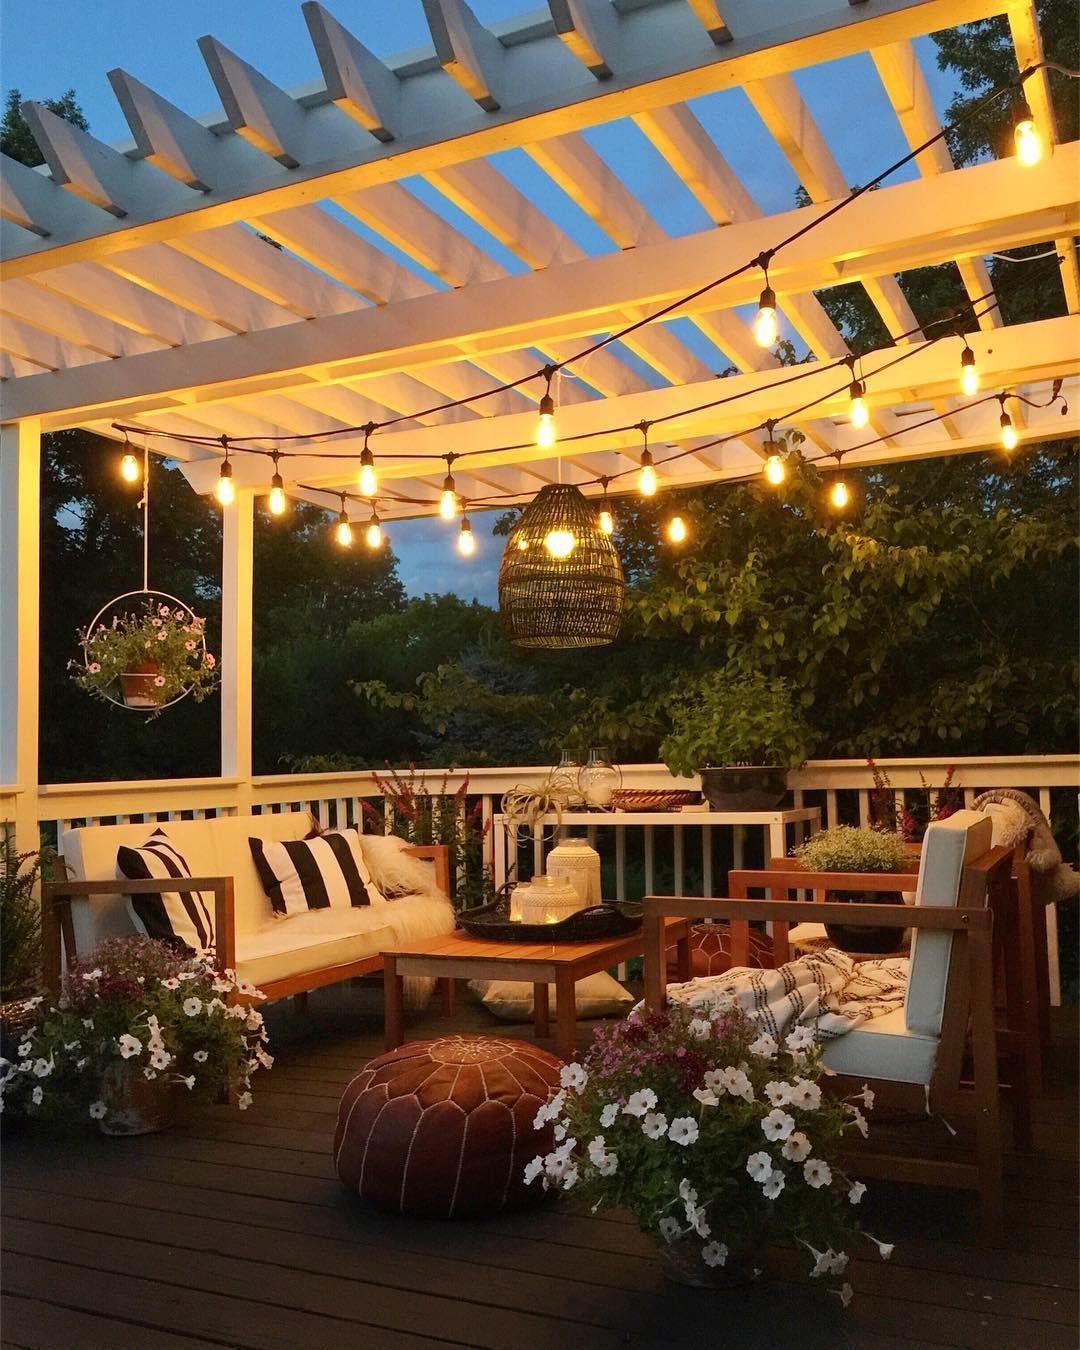 Garden Lights Terrassenpergola Pergola Beleuchtung Im Freien